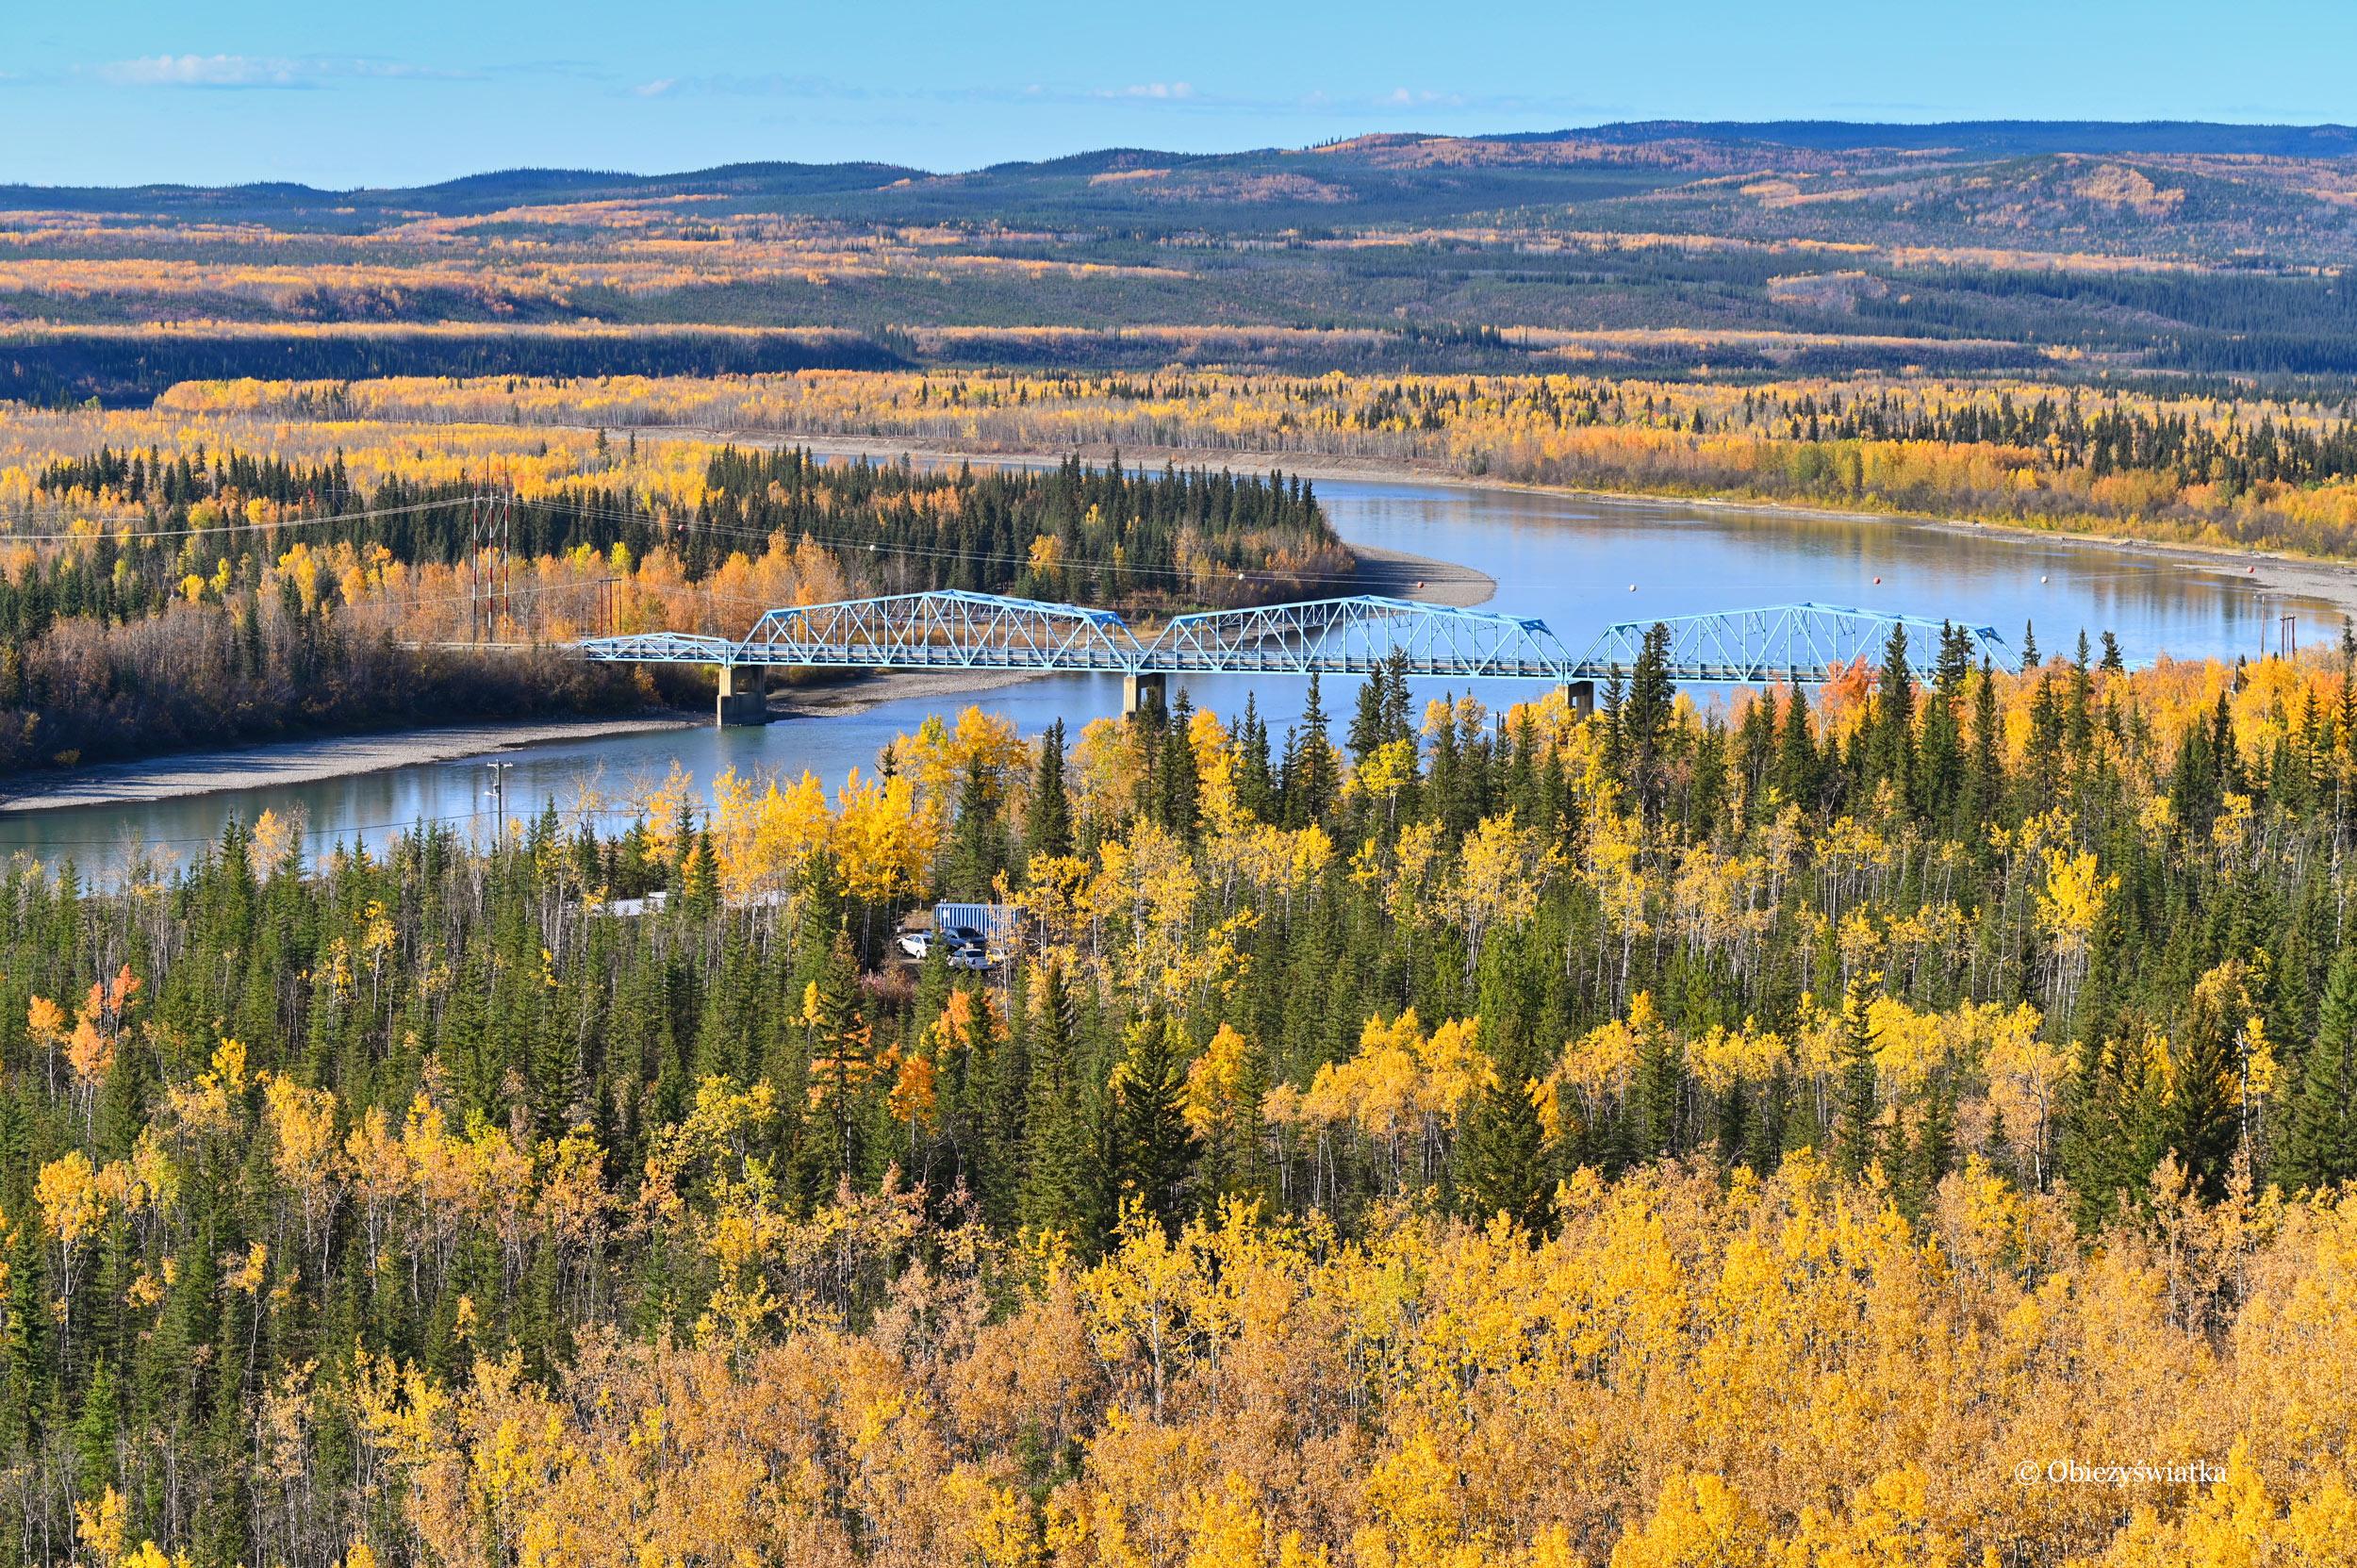 Rzeka Yukon - widok z Klondike Highway, Kanada